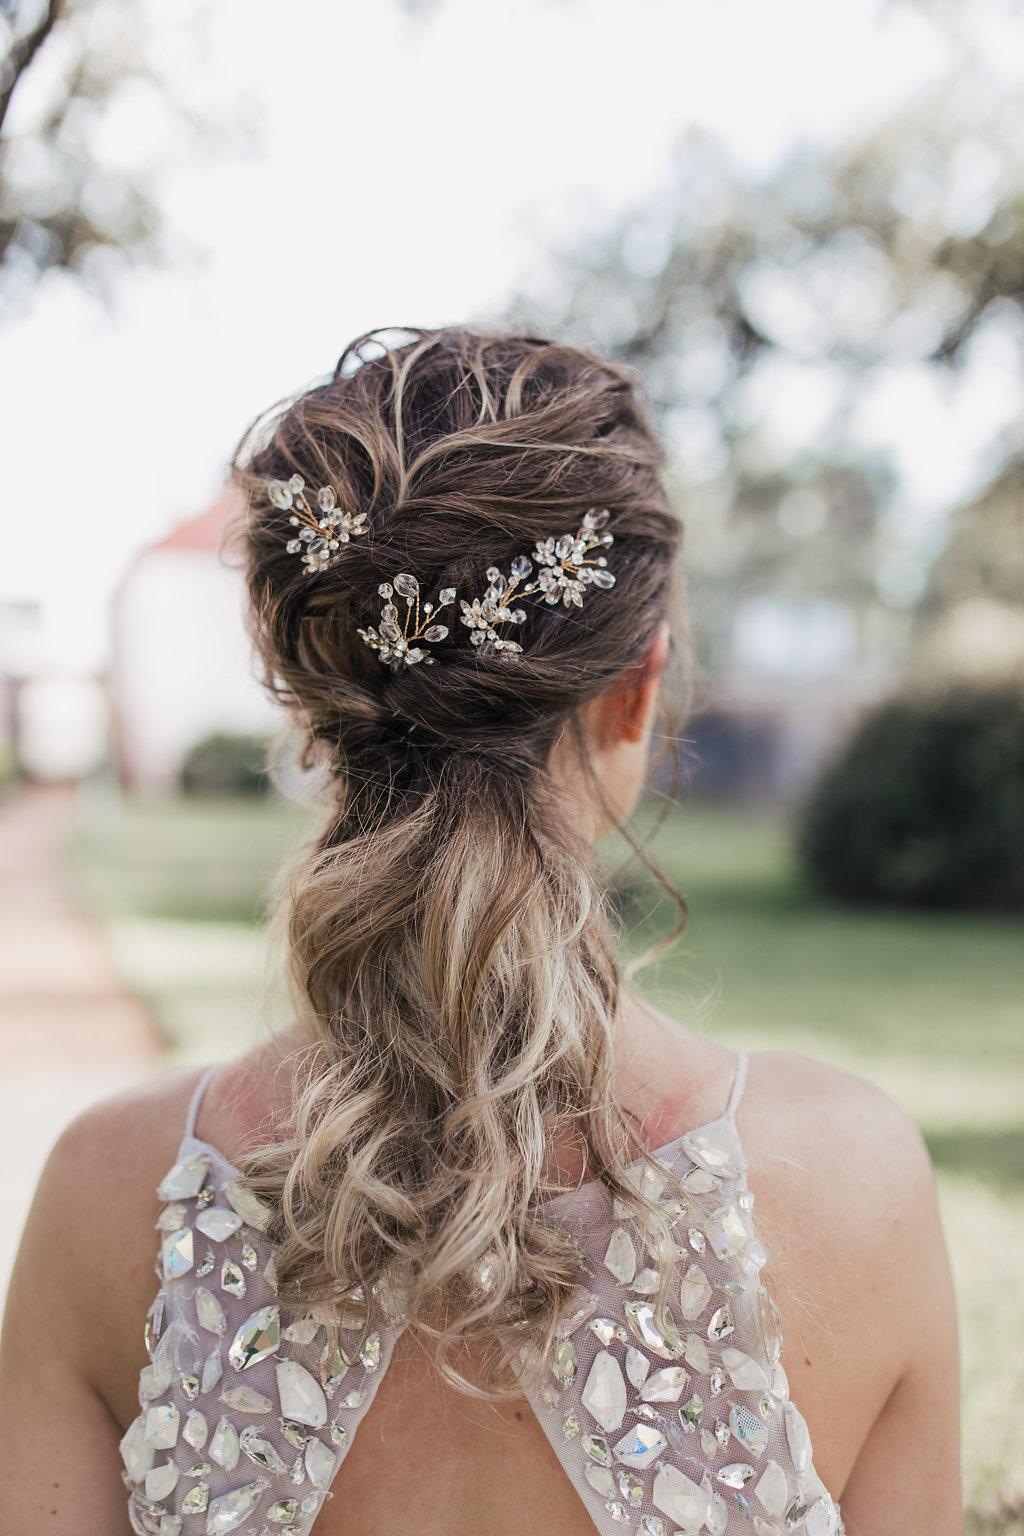 glam wedding hair details - photo by Alondra Vega Photography https://ruffledblog.com/jewel-toned-wedding-ideas-with-a-surprise-proposal